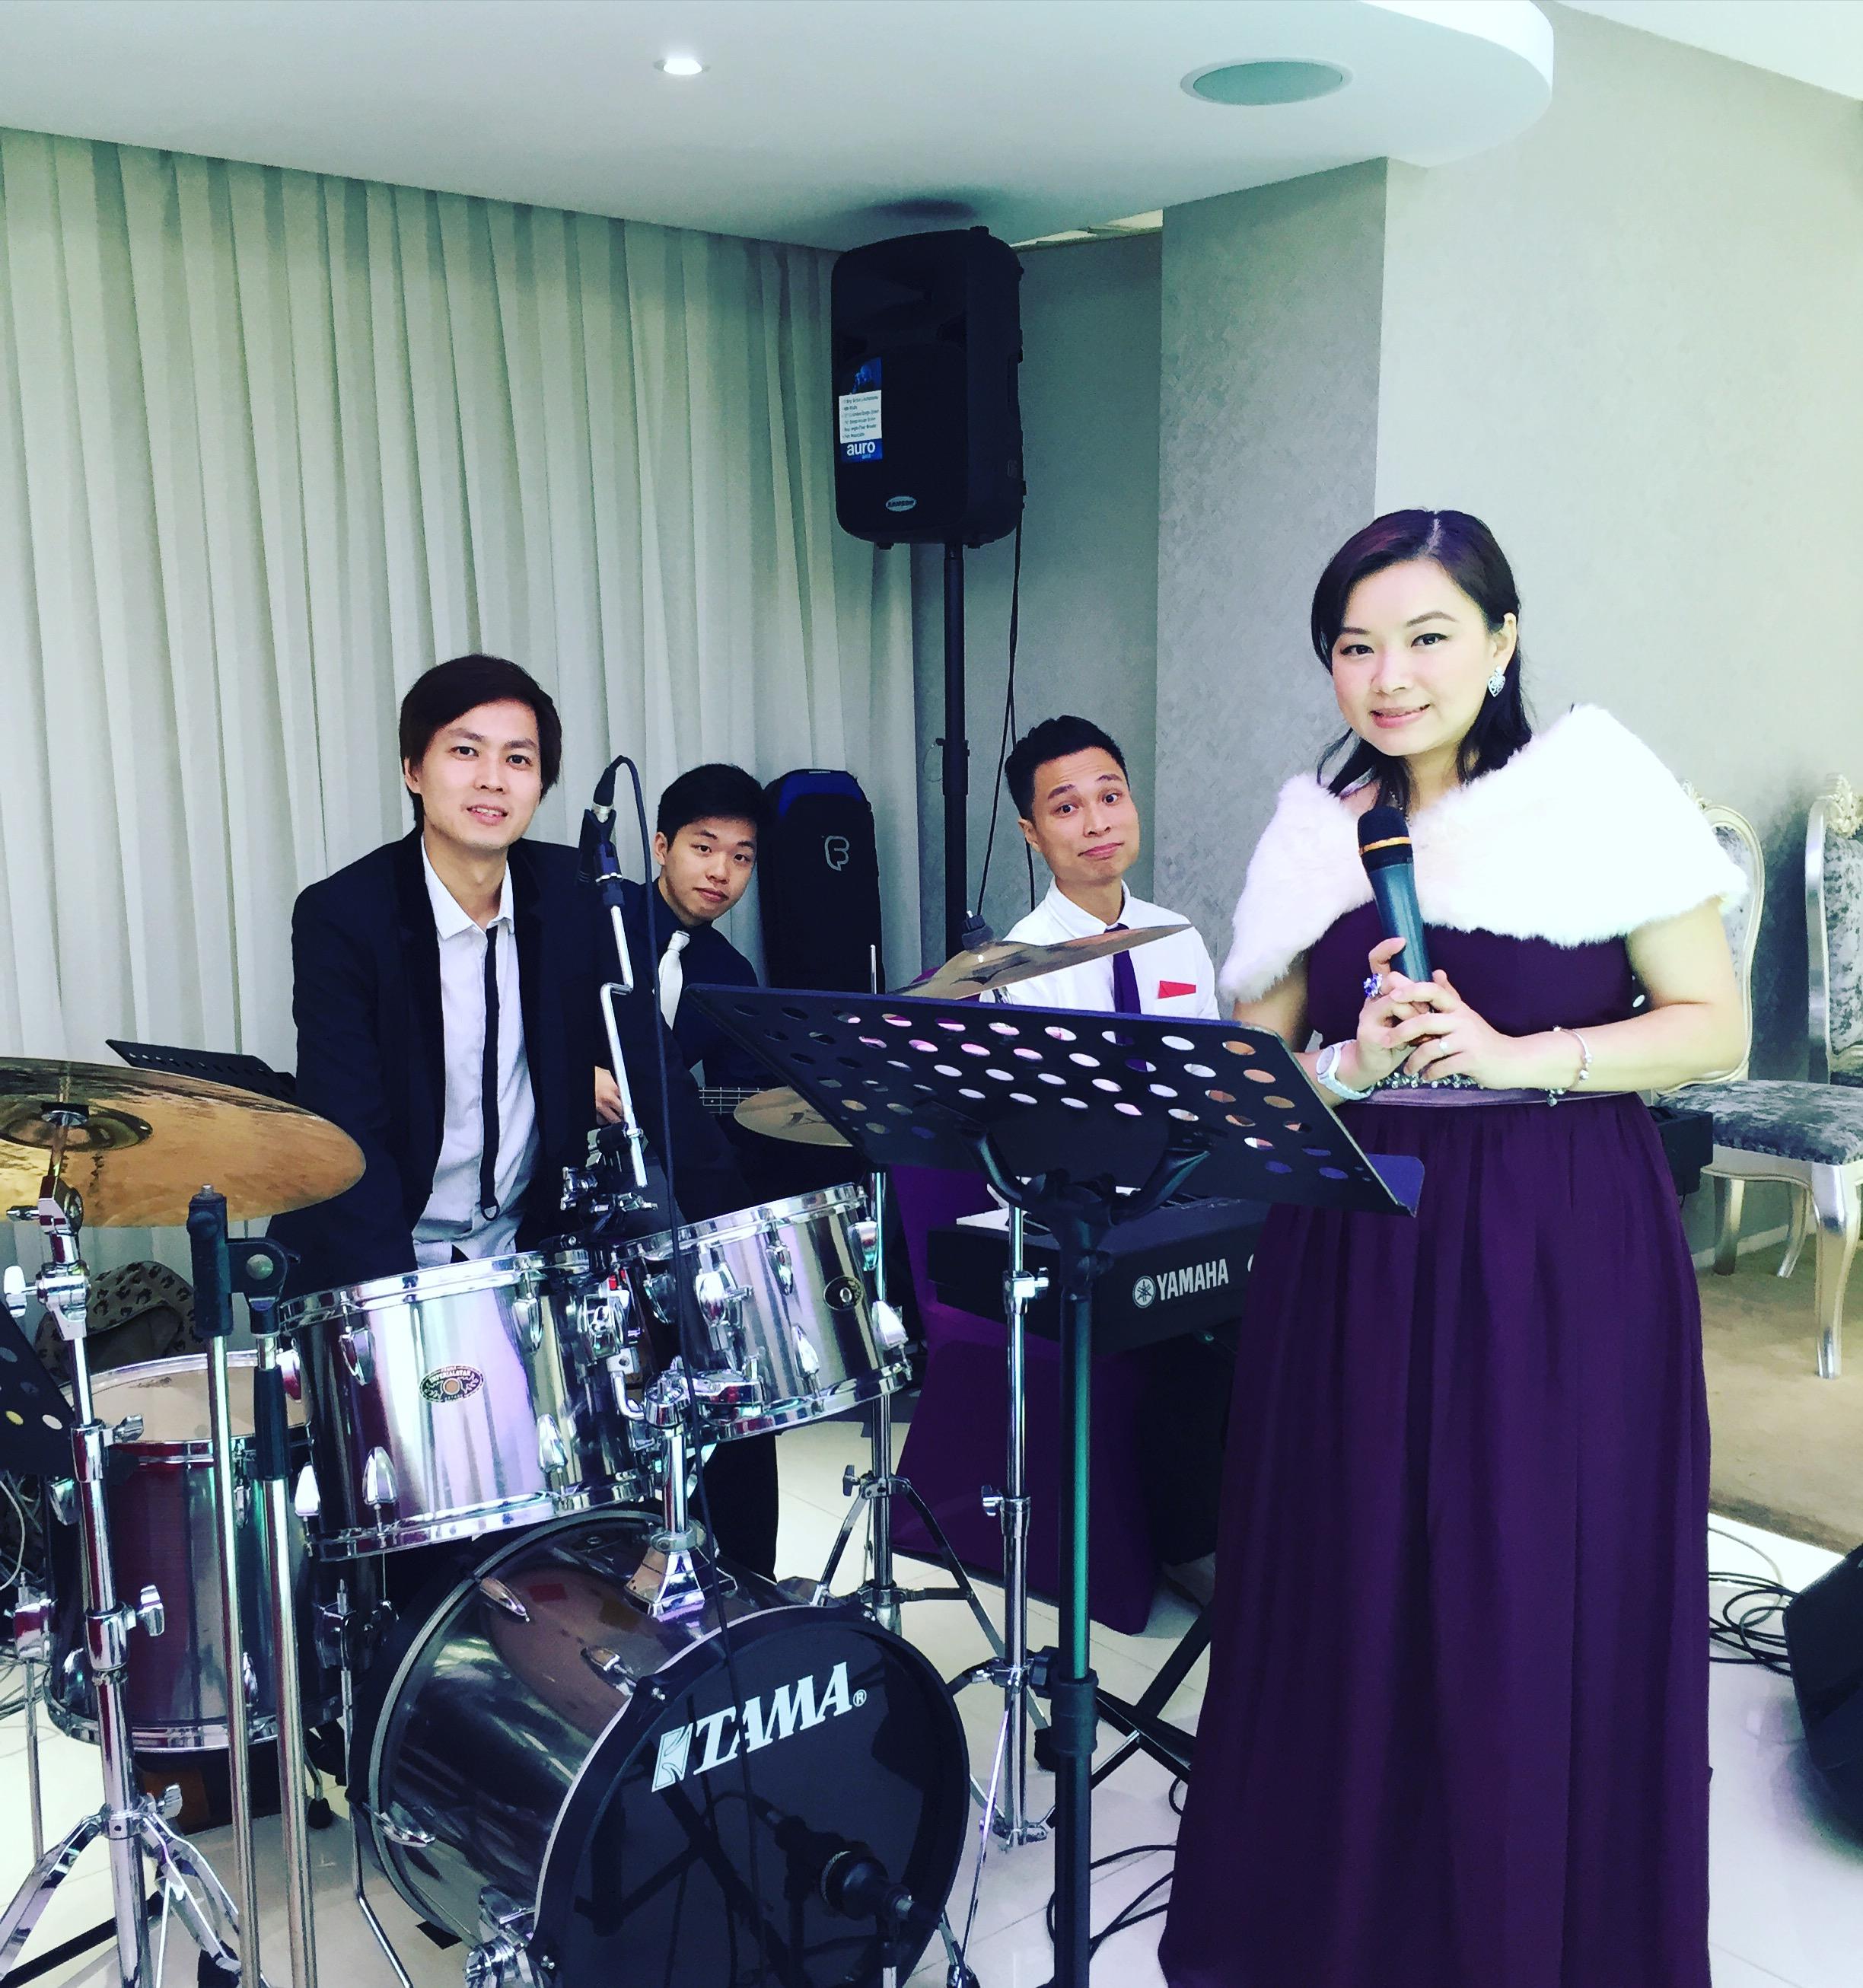 Live Band Performance